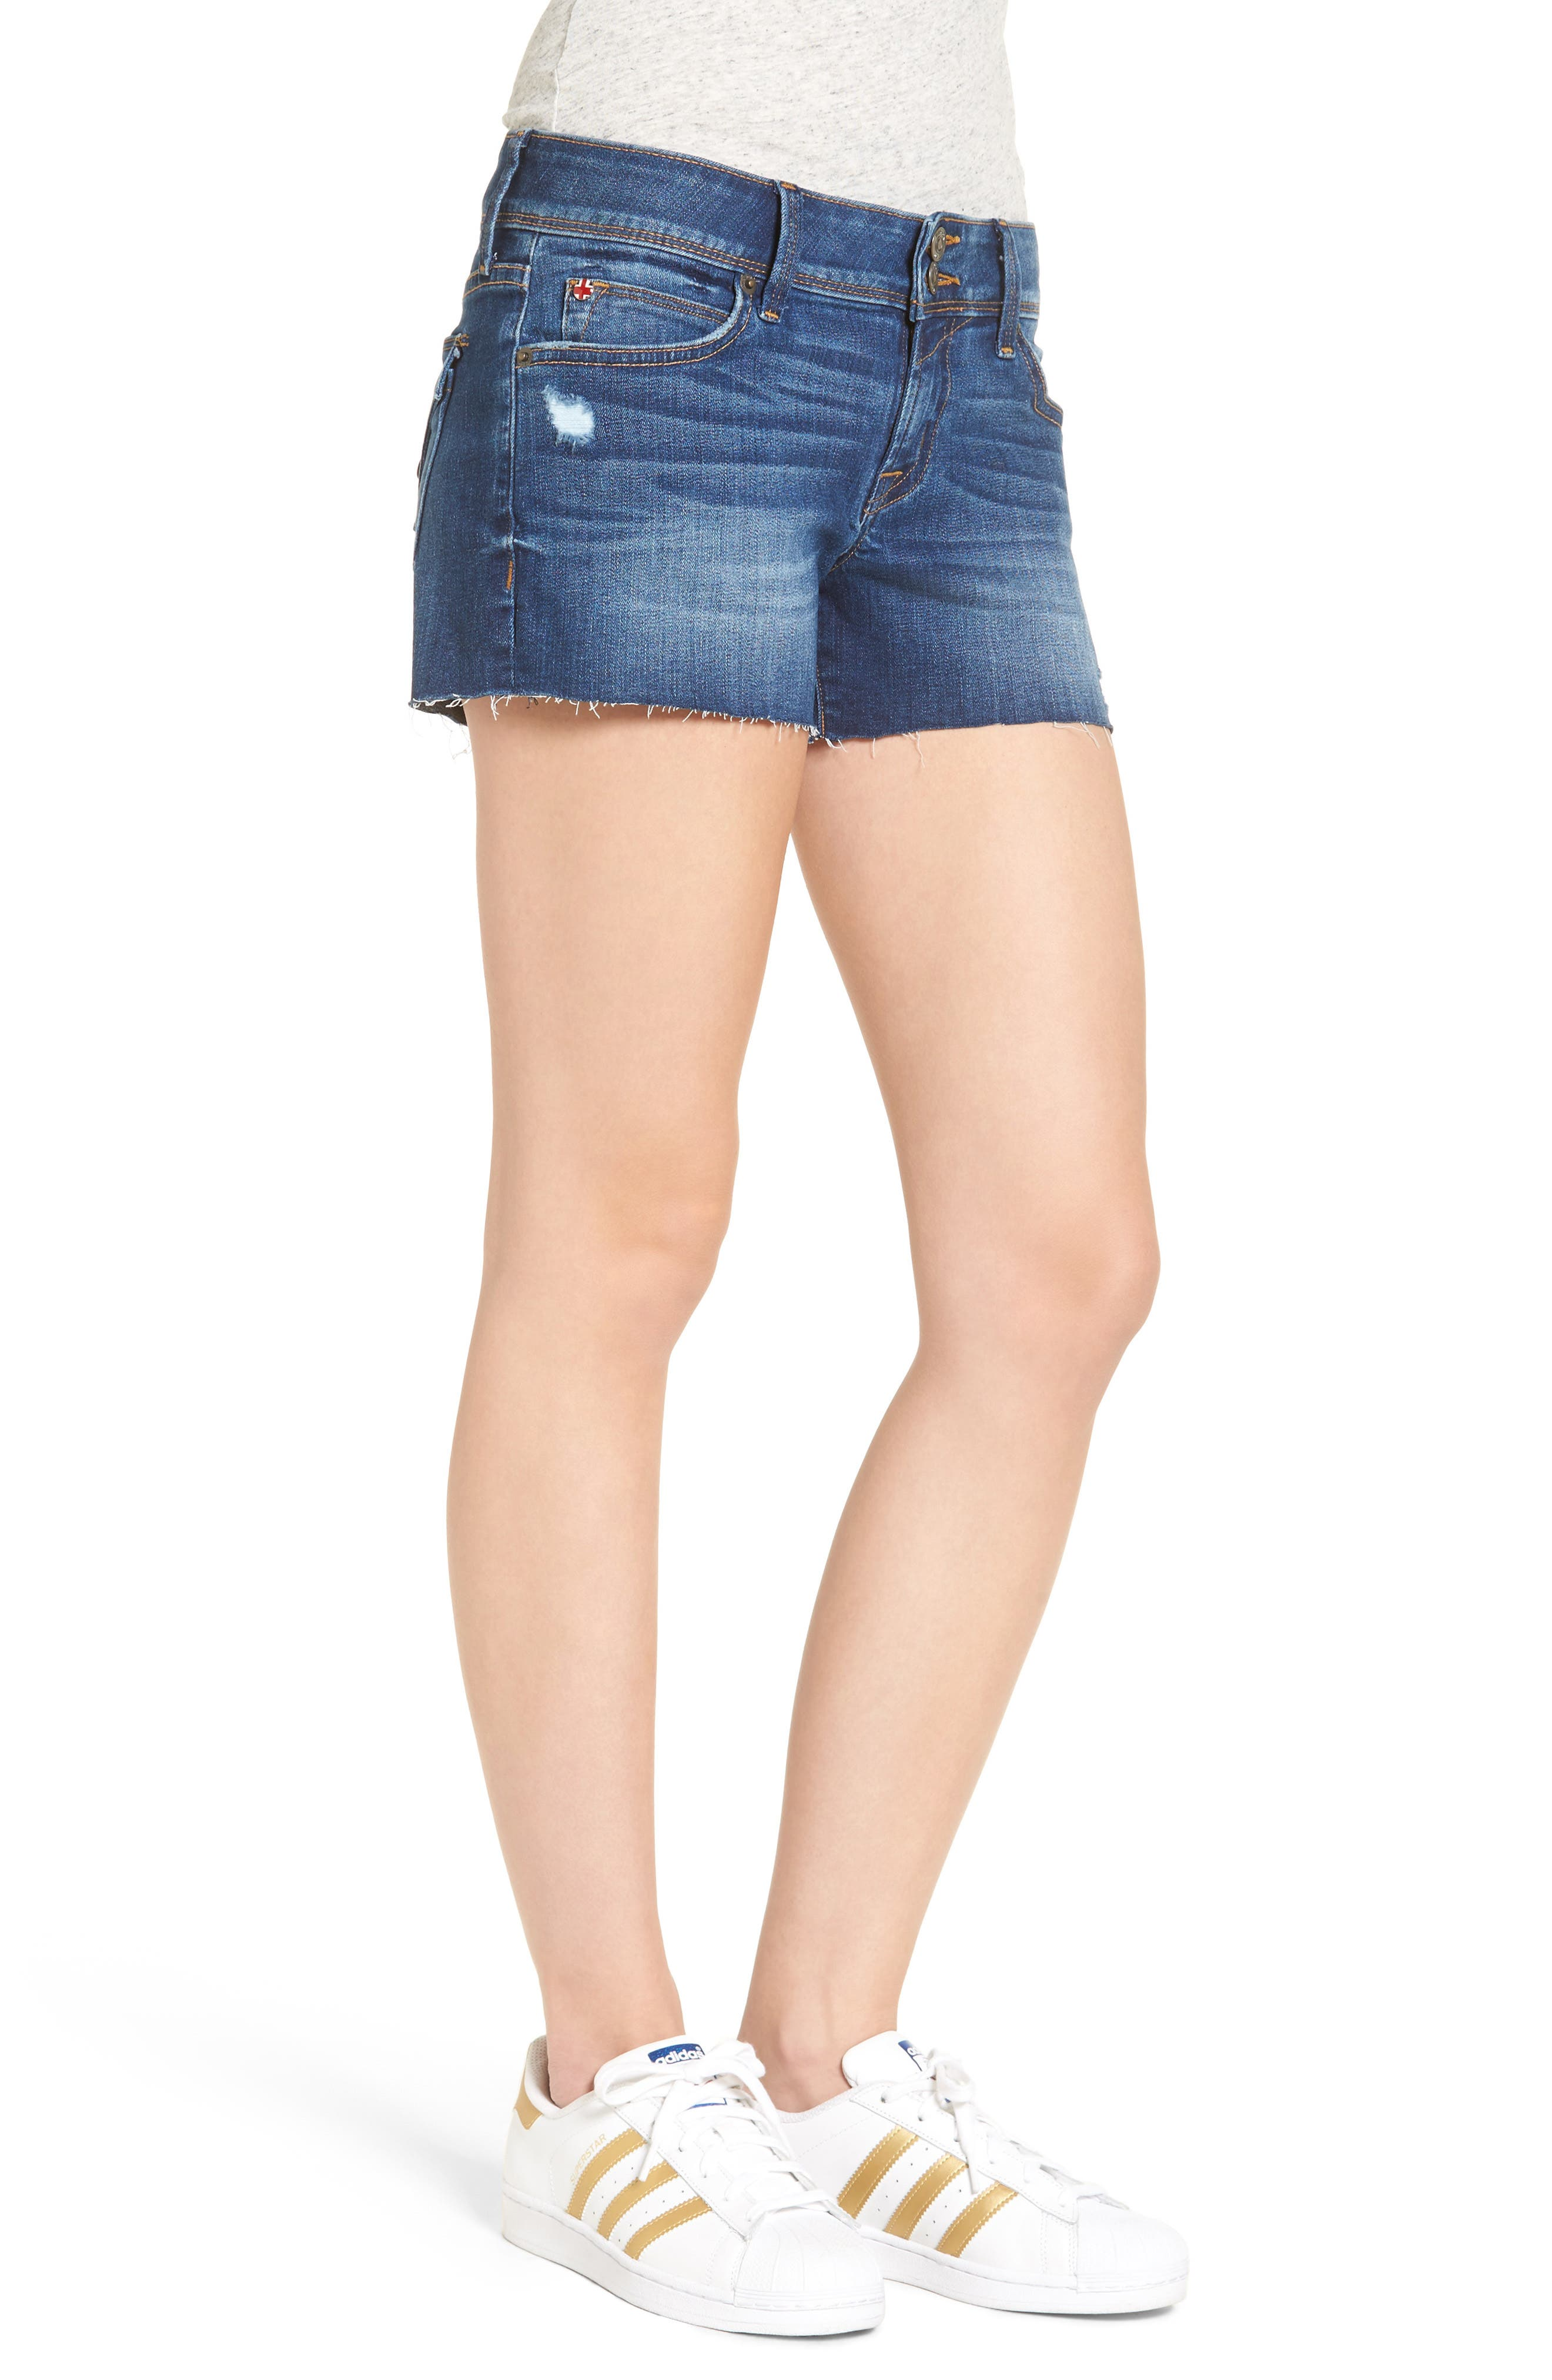 Croxley Cutoff Denim Shorts,                             Alternate thumbnail 3, color,                             401